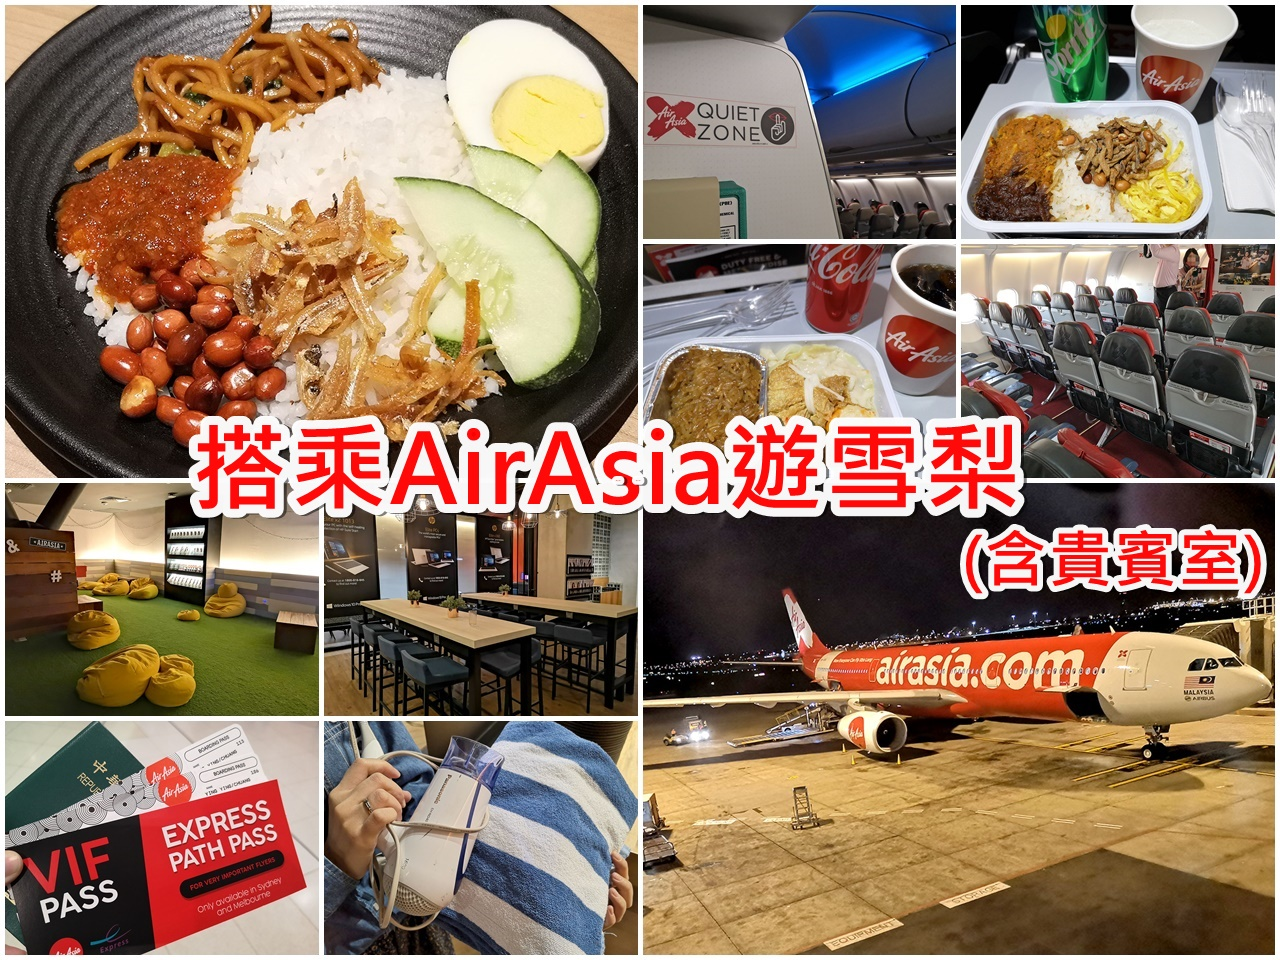 AirAsia 台北飛雪梨只要1萬出頭!(含吉隆坡貴賓室) @愛吃鬼芸芸